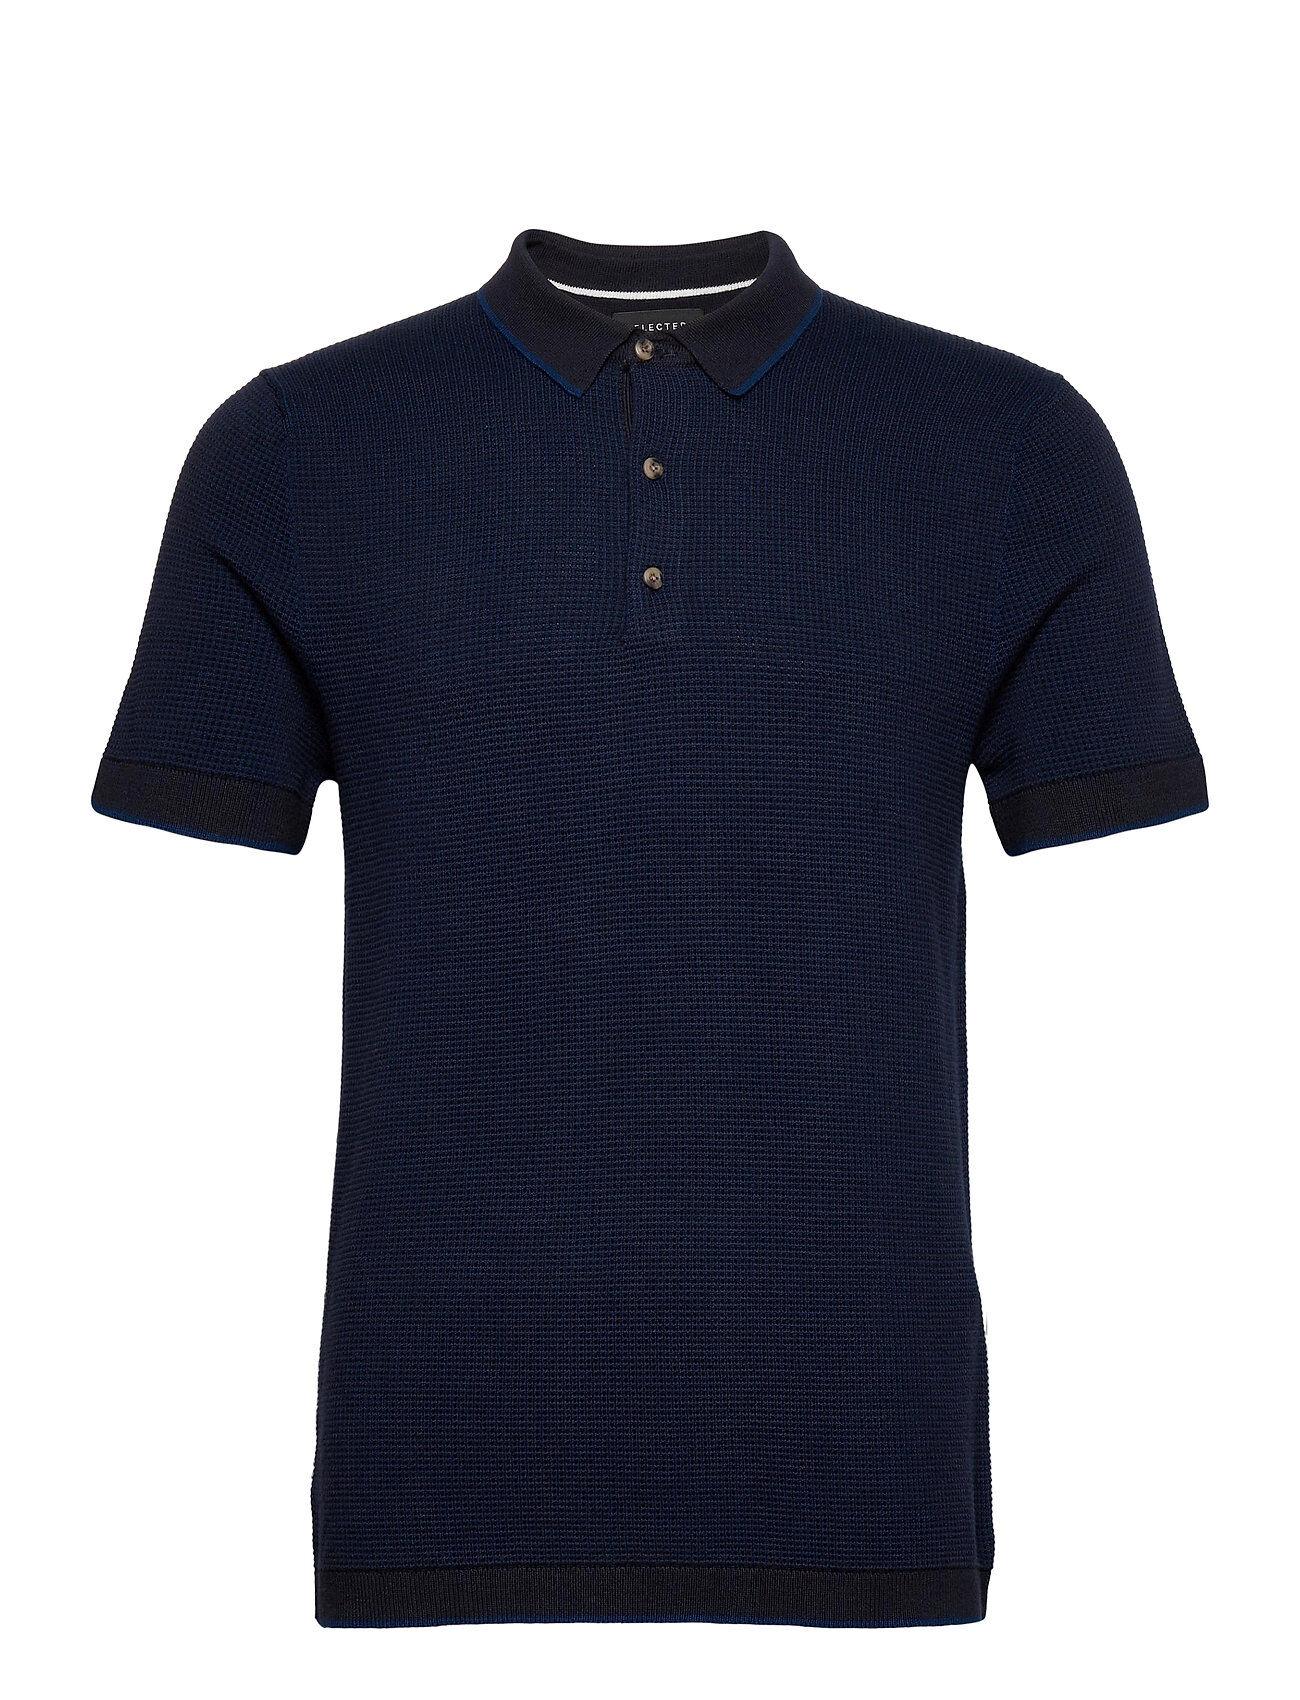 Selected Homme Slhbeak Ss Polo B Polos Short-sleeved Sininen Selected Homme